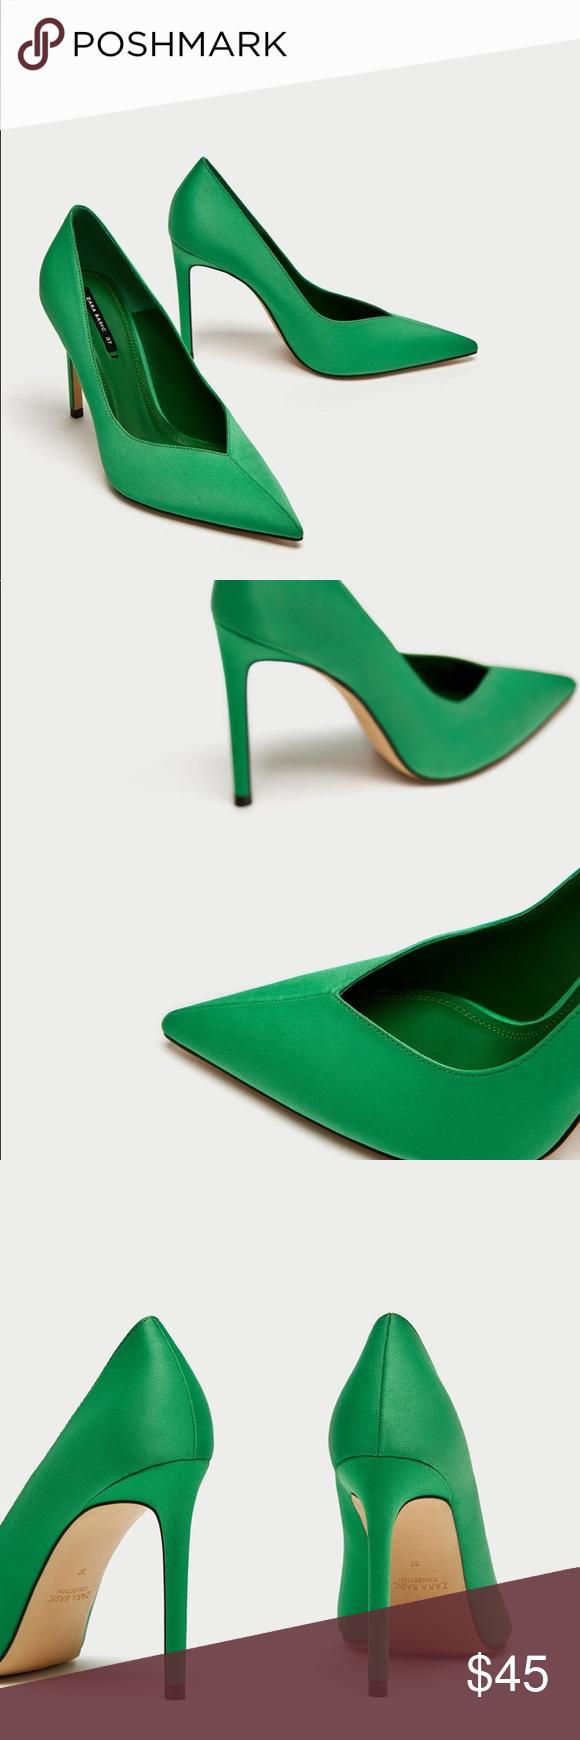 Zara Green V Vamp High Heel Court Shoes Heels Stiletto Heels Green High Heels